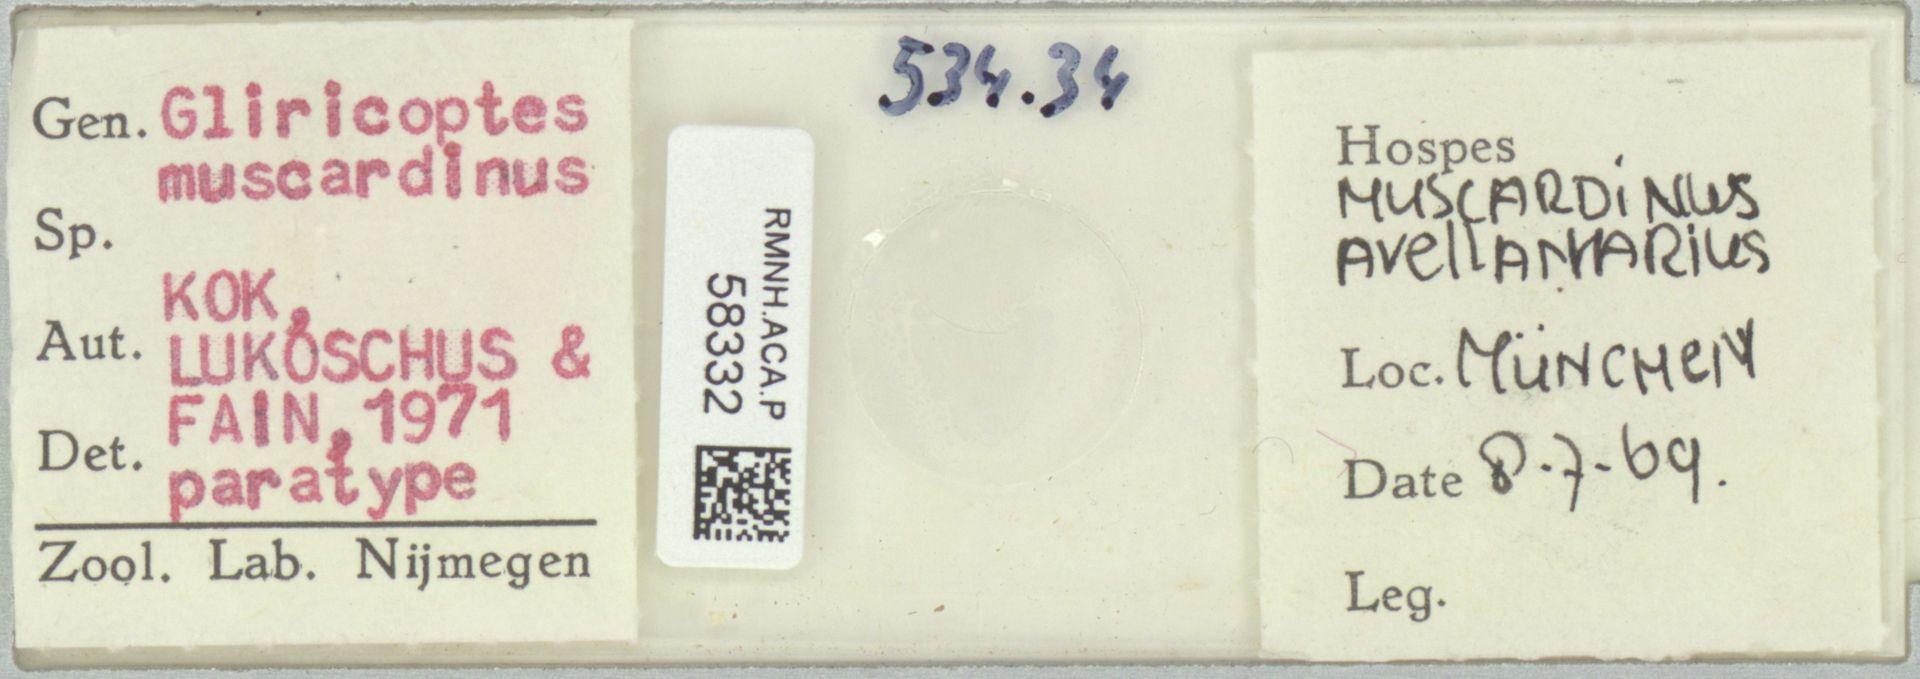 RMNH.ACA.P.58332   Gliricoptes muscardinus Kok, Lukoschus & Fain 1971